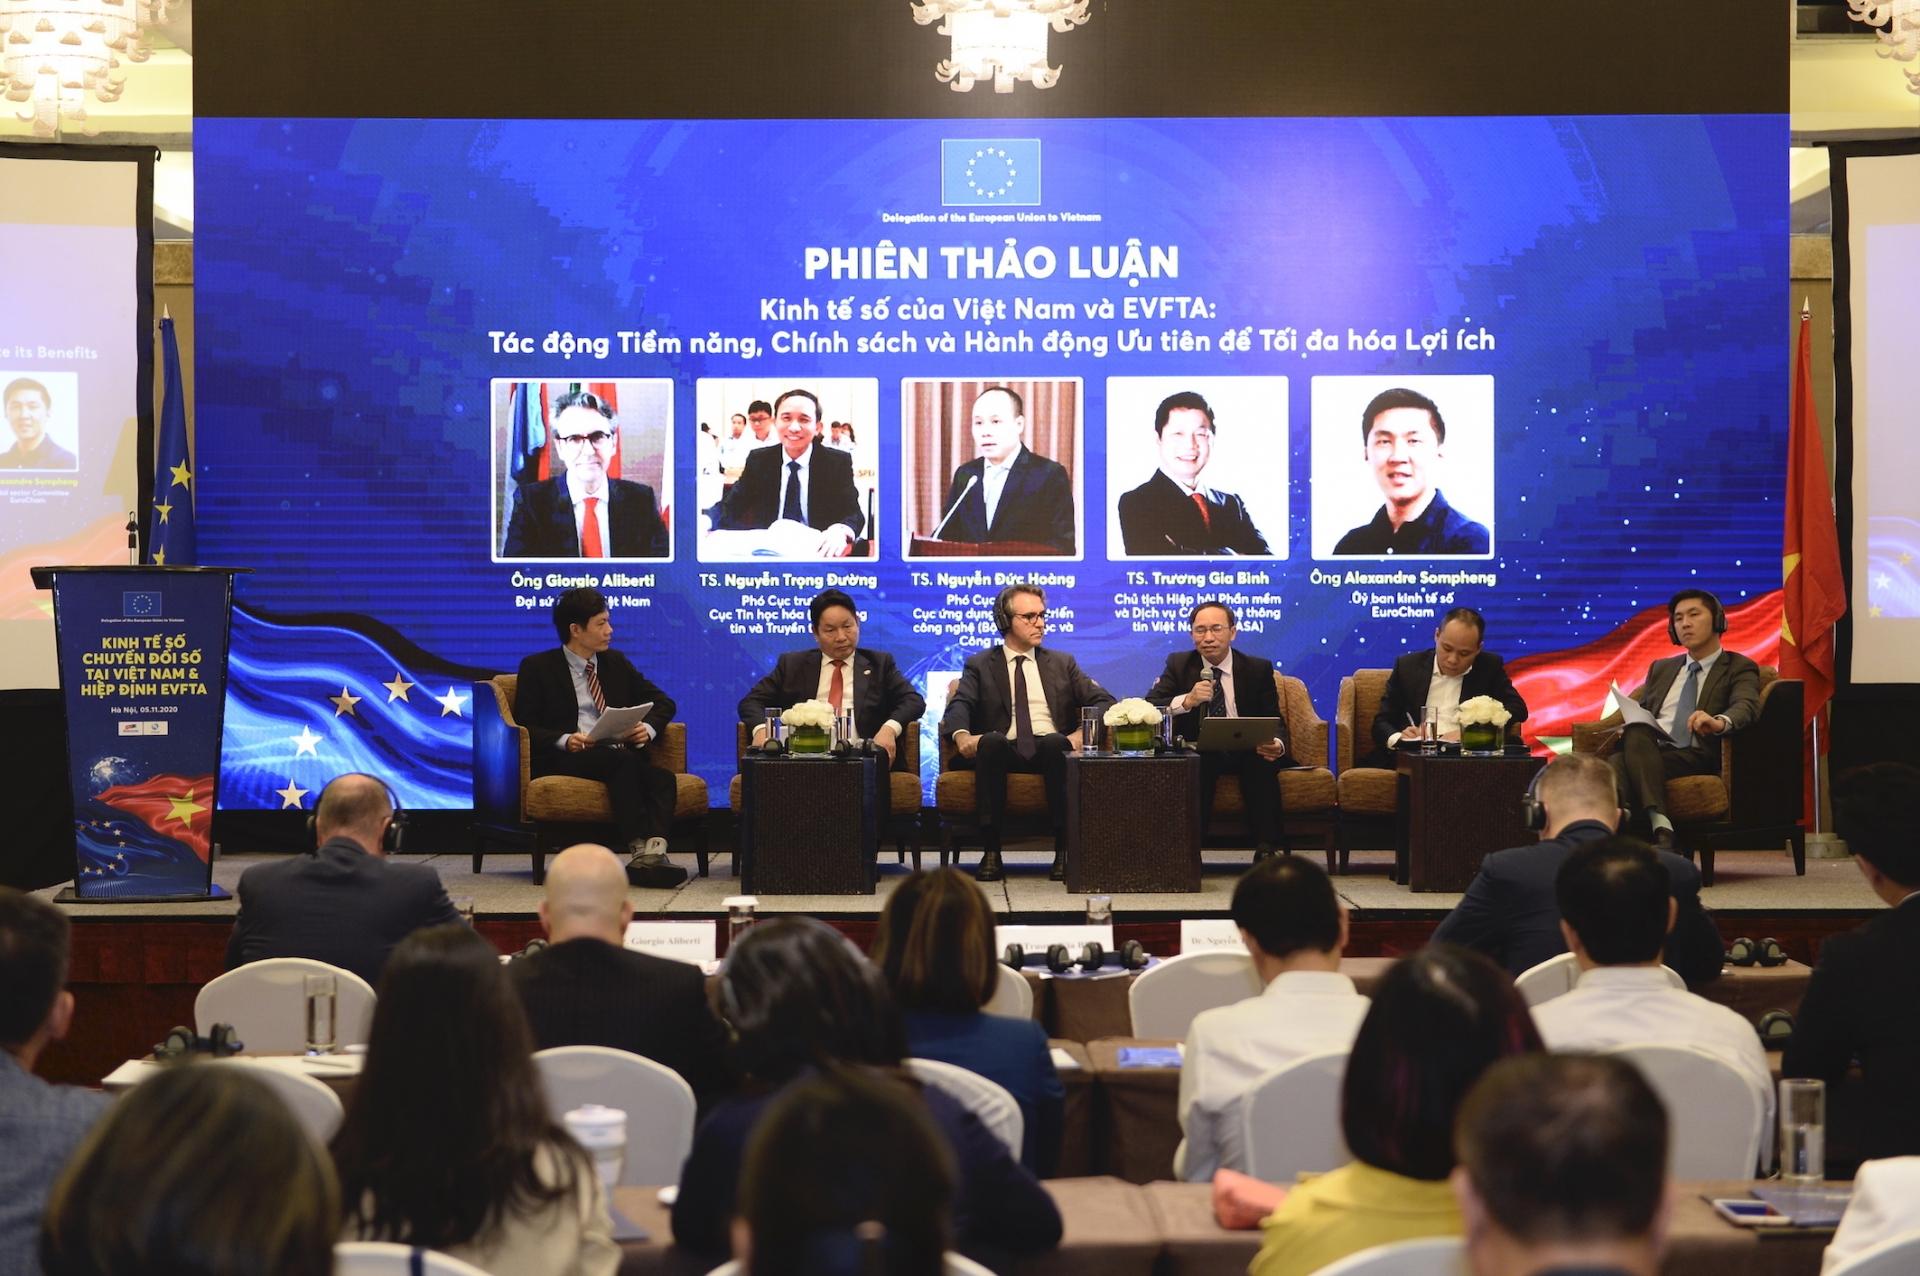 EVFTA to spur Vietnam's digital transformation